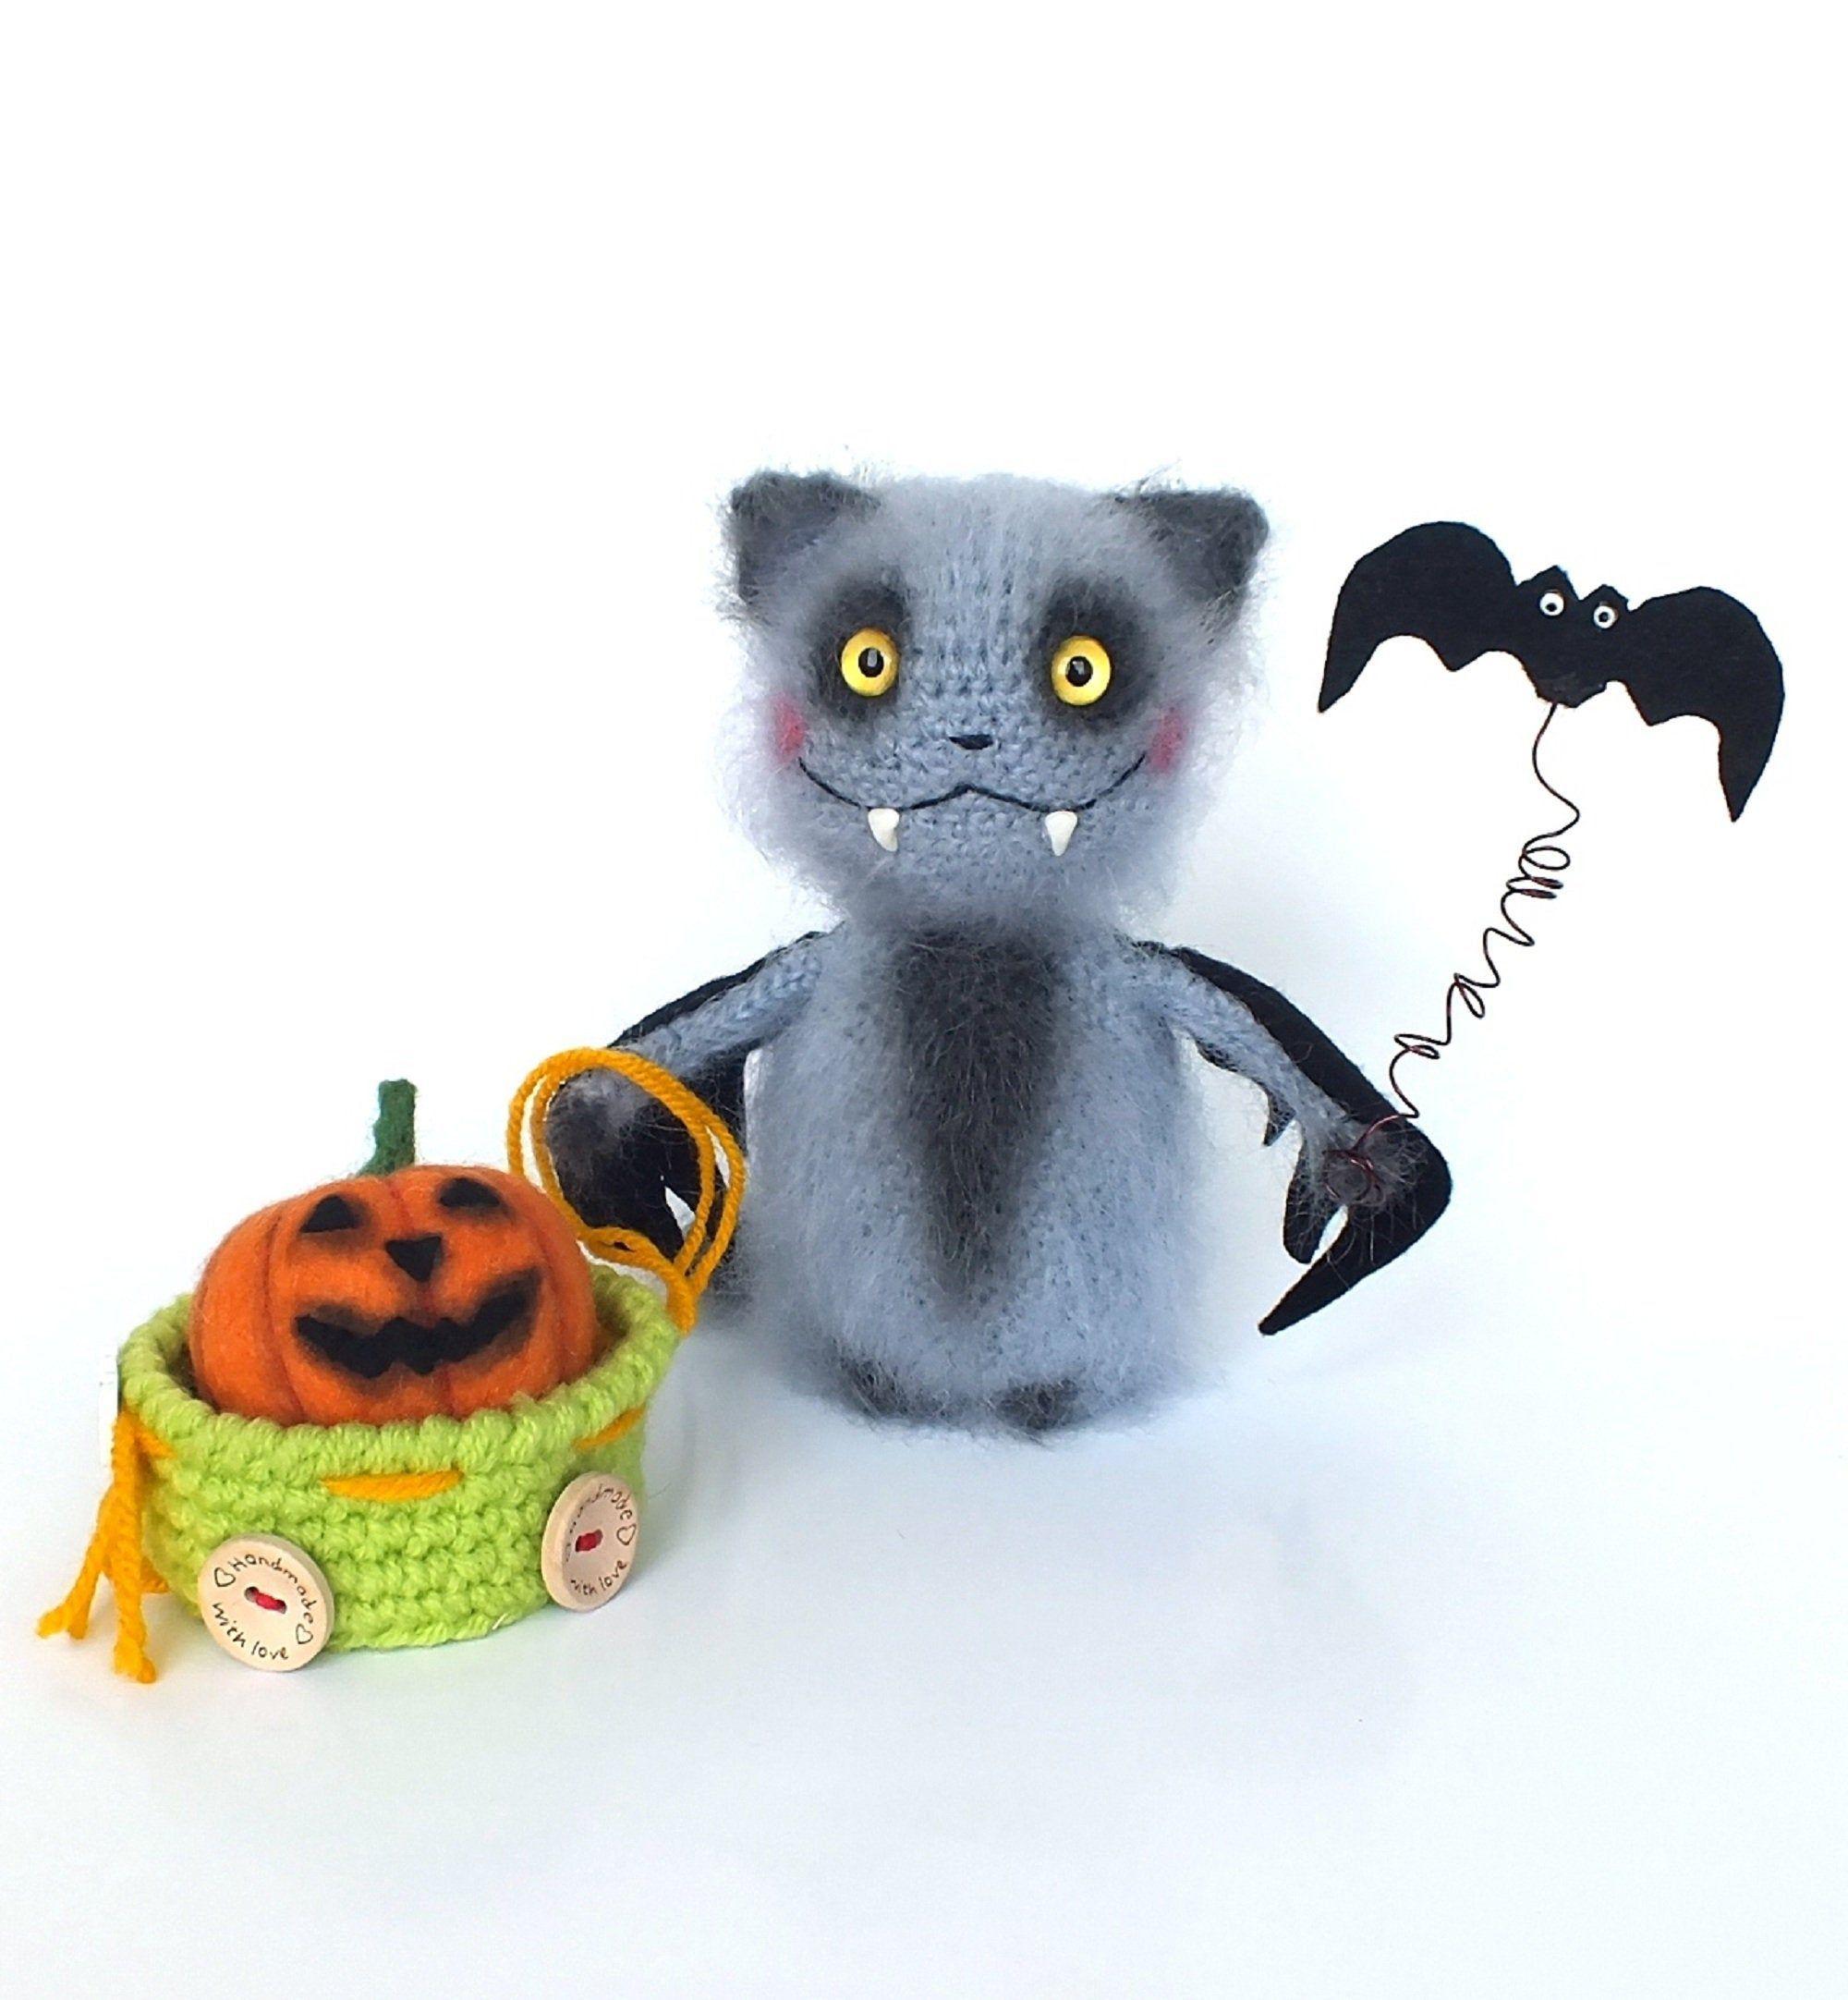 Cat stuffed animal, Amigurumi knitted toy Halloween Home